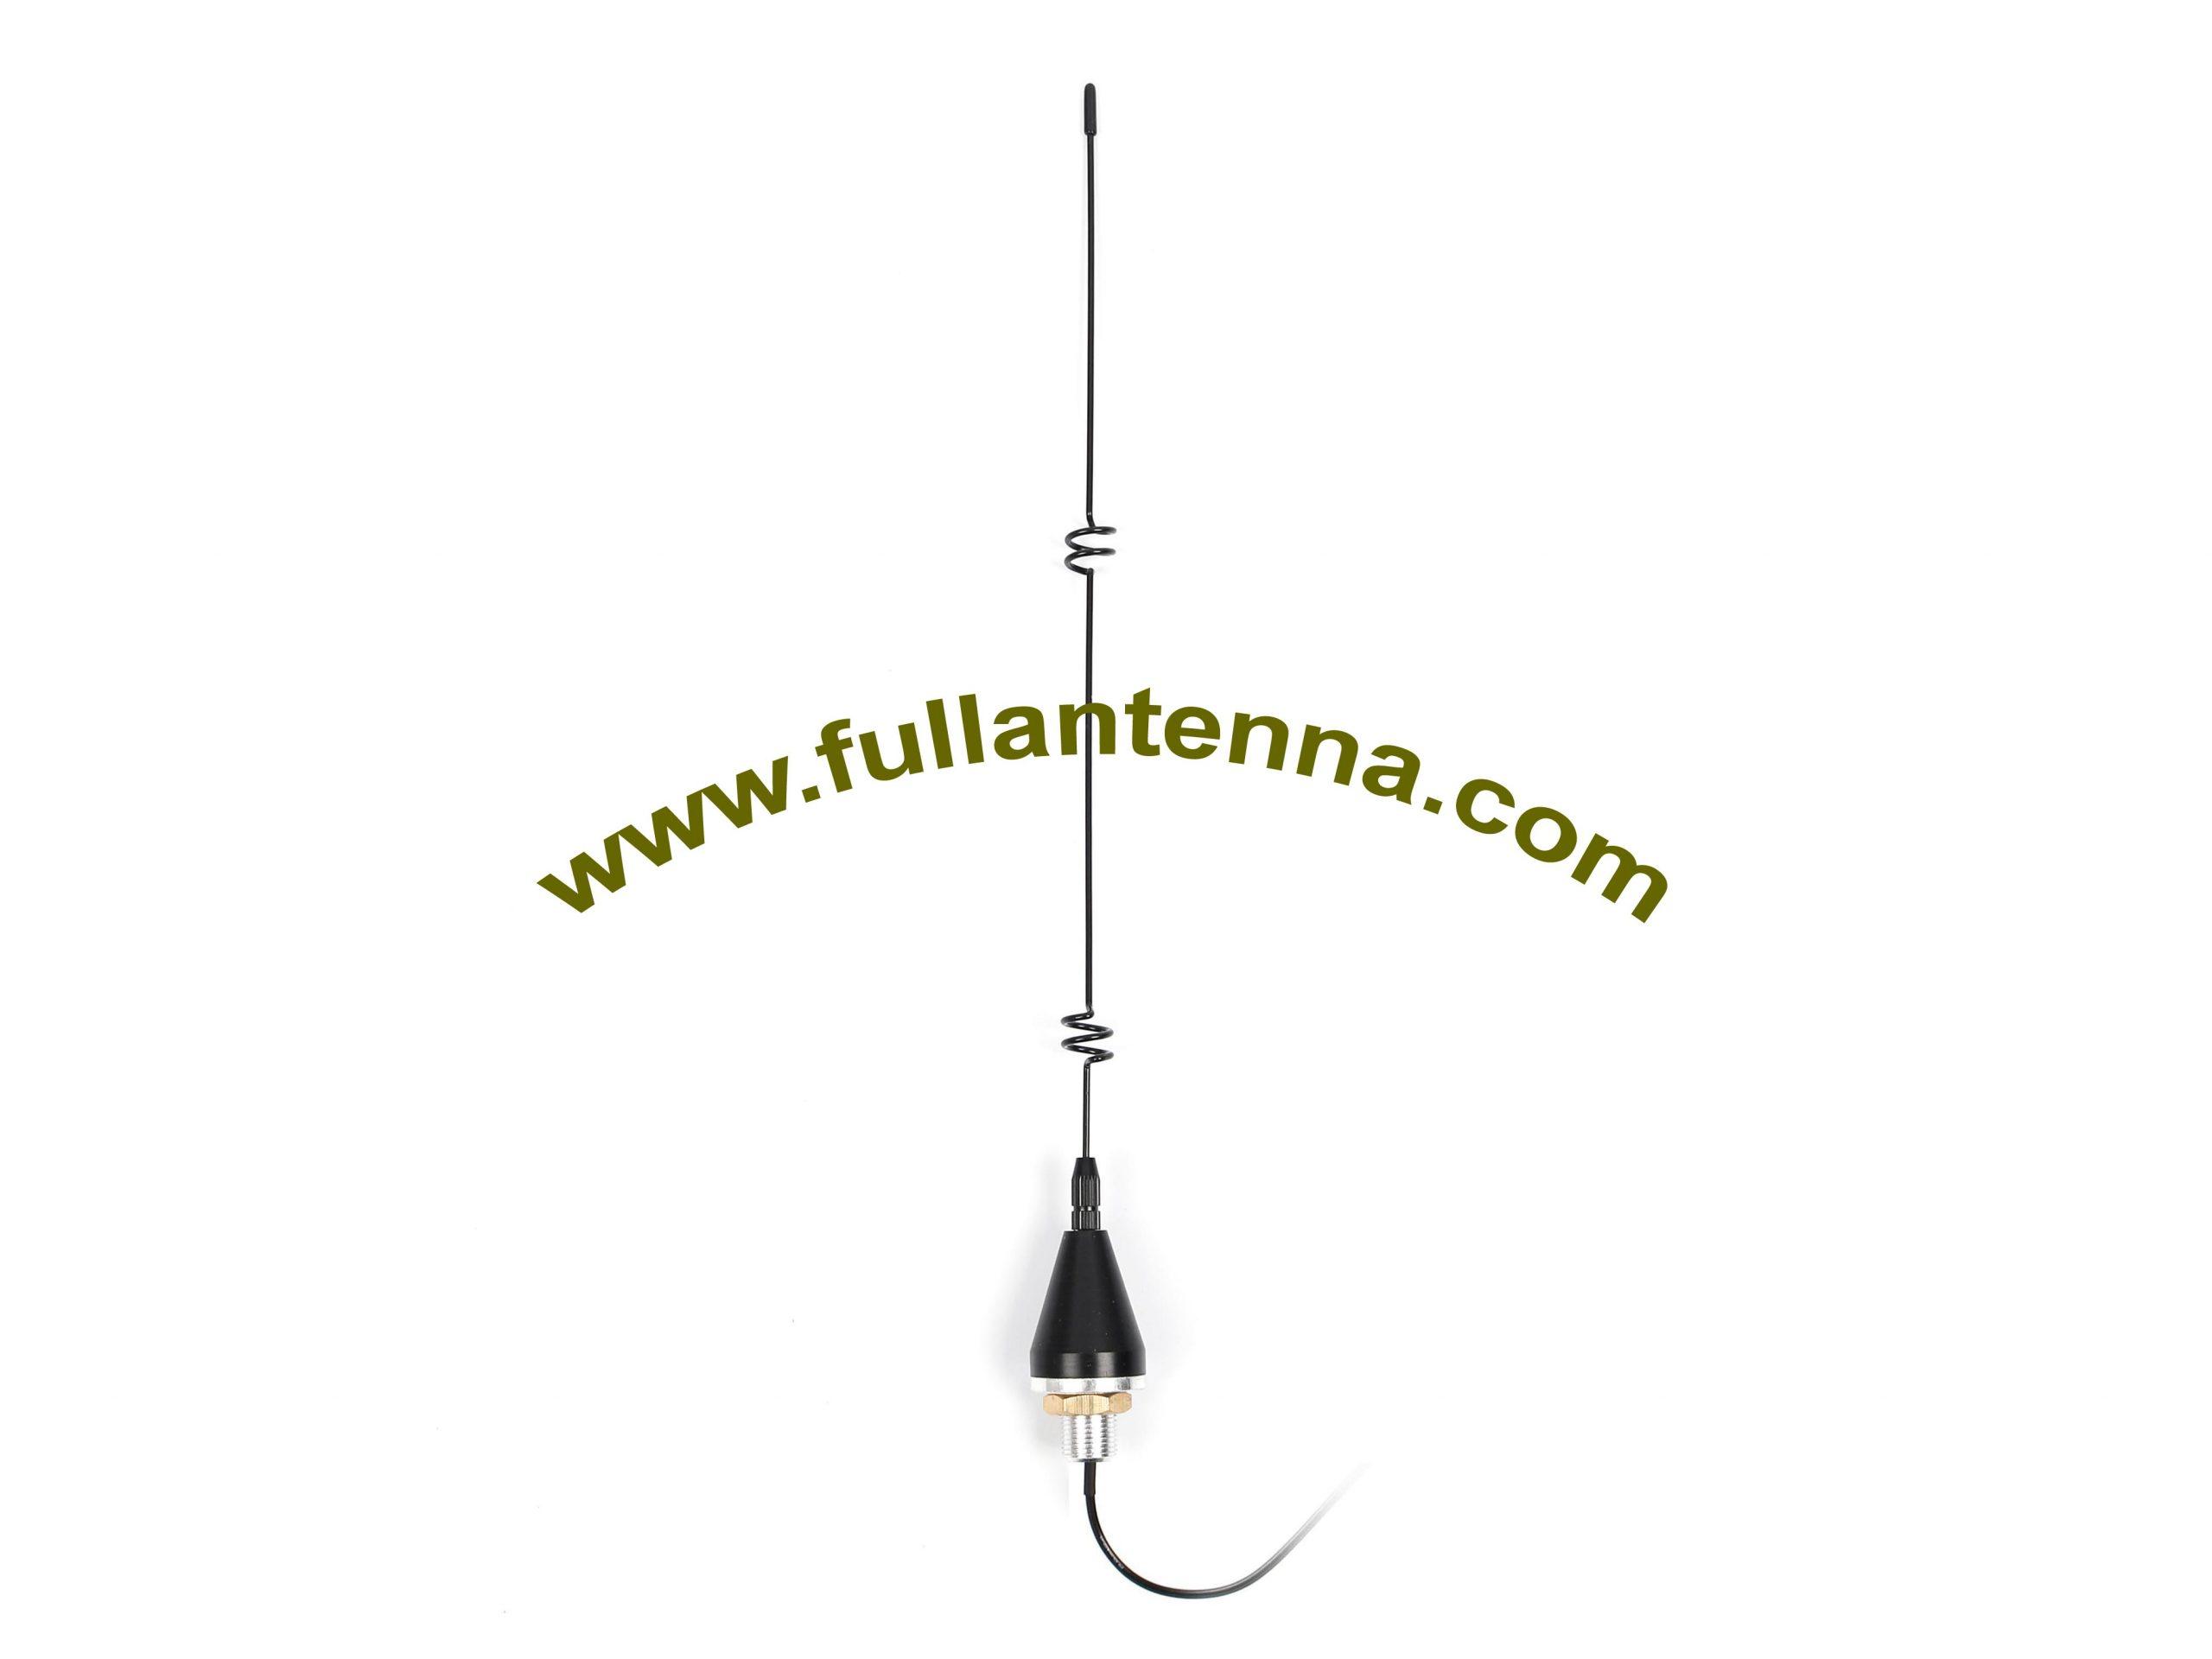 P/N:FA3G.0603,3G External Antenna,3G METAL whip outdoor screw  antenna